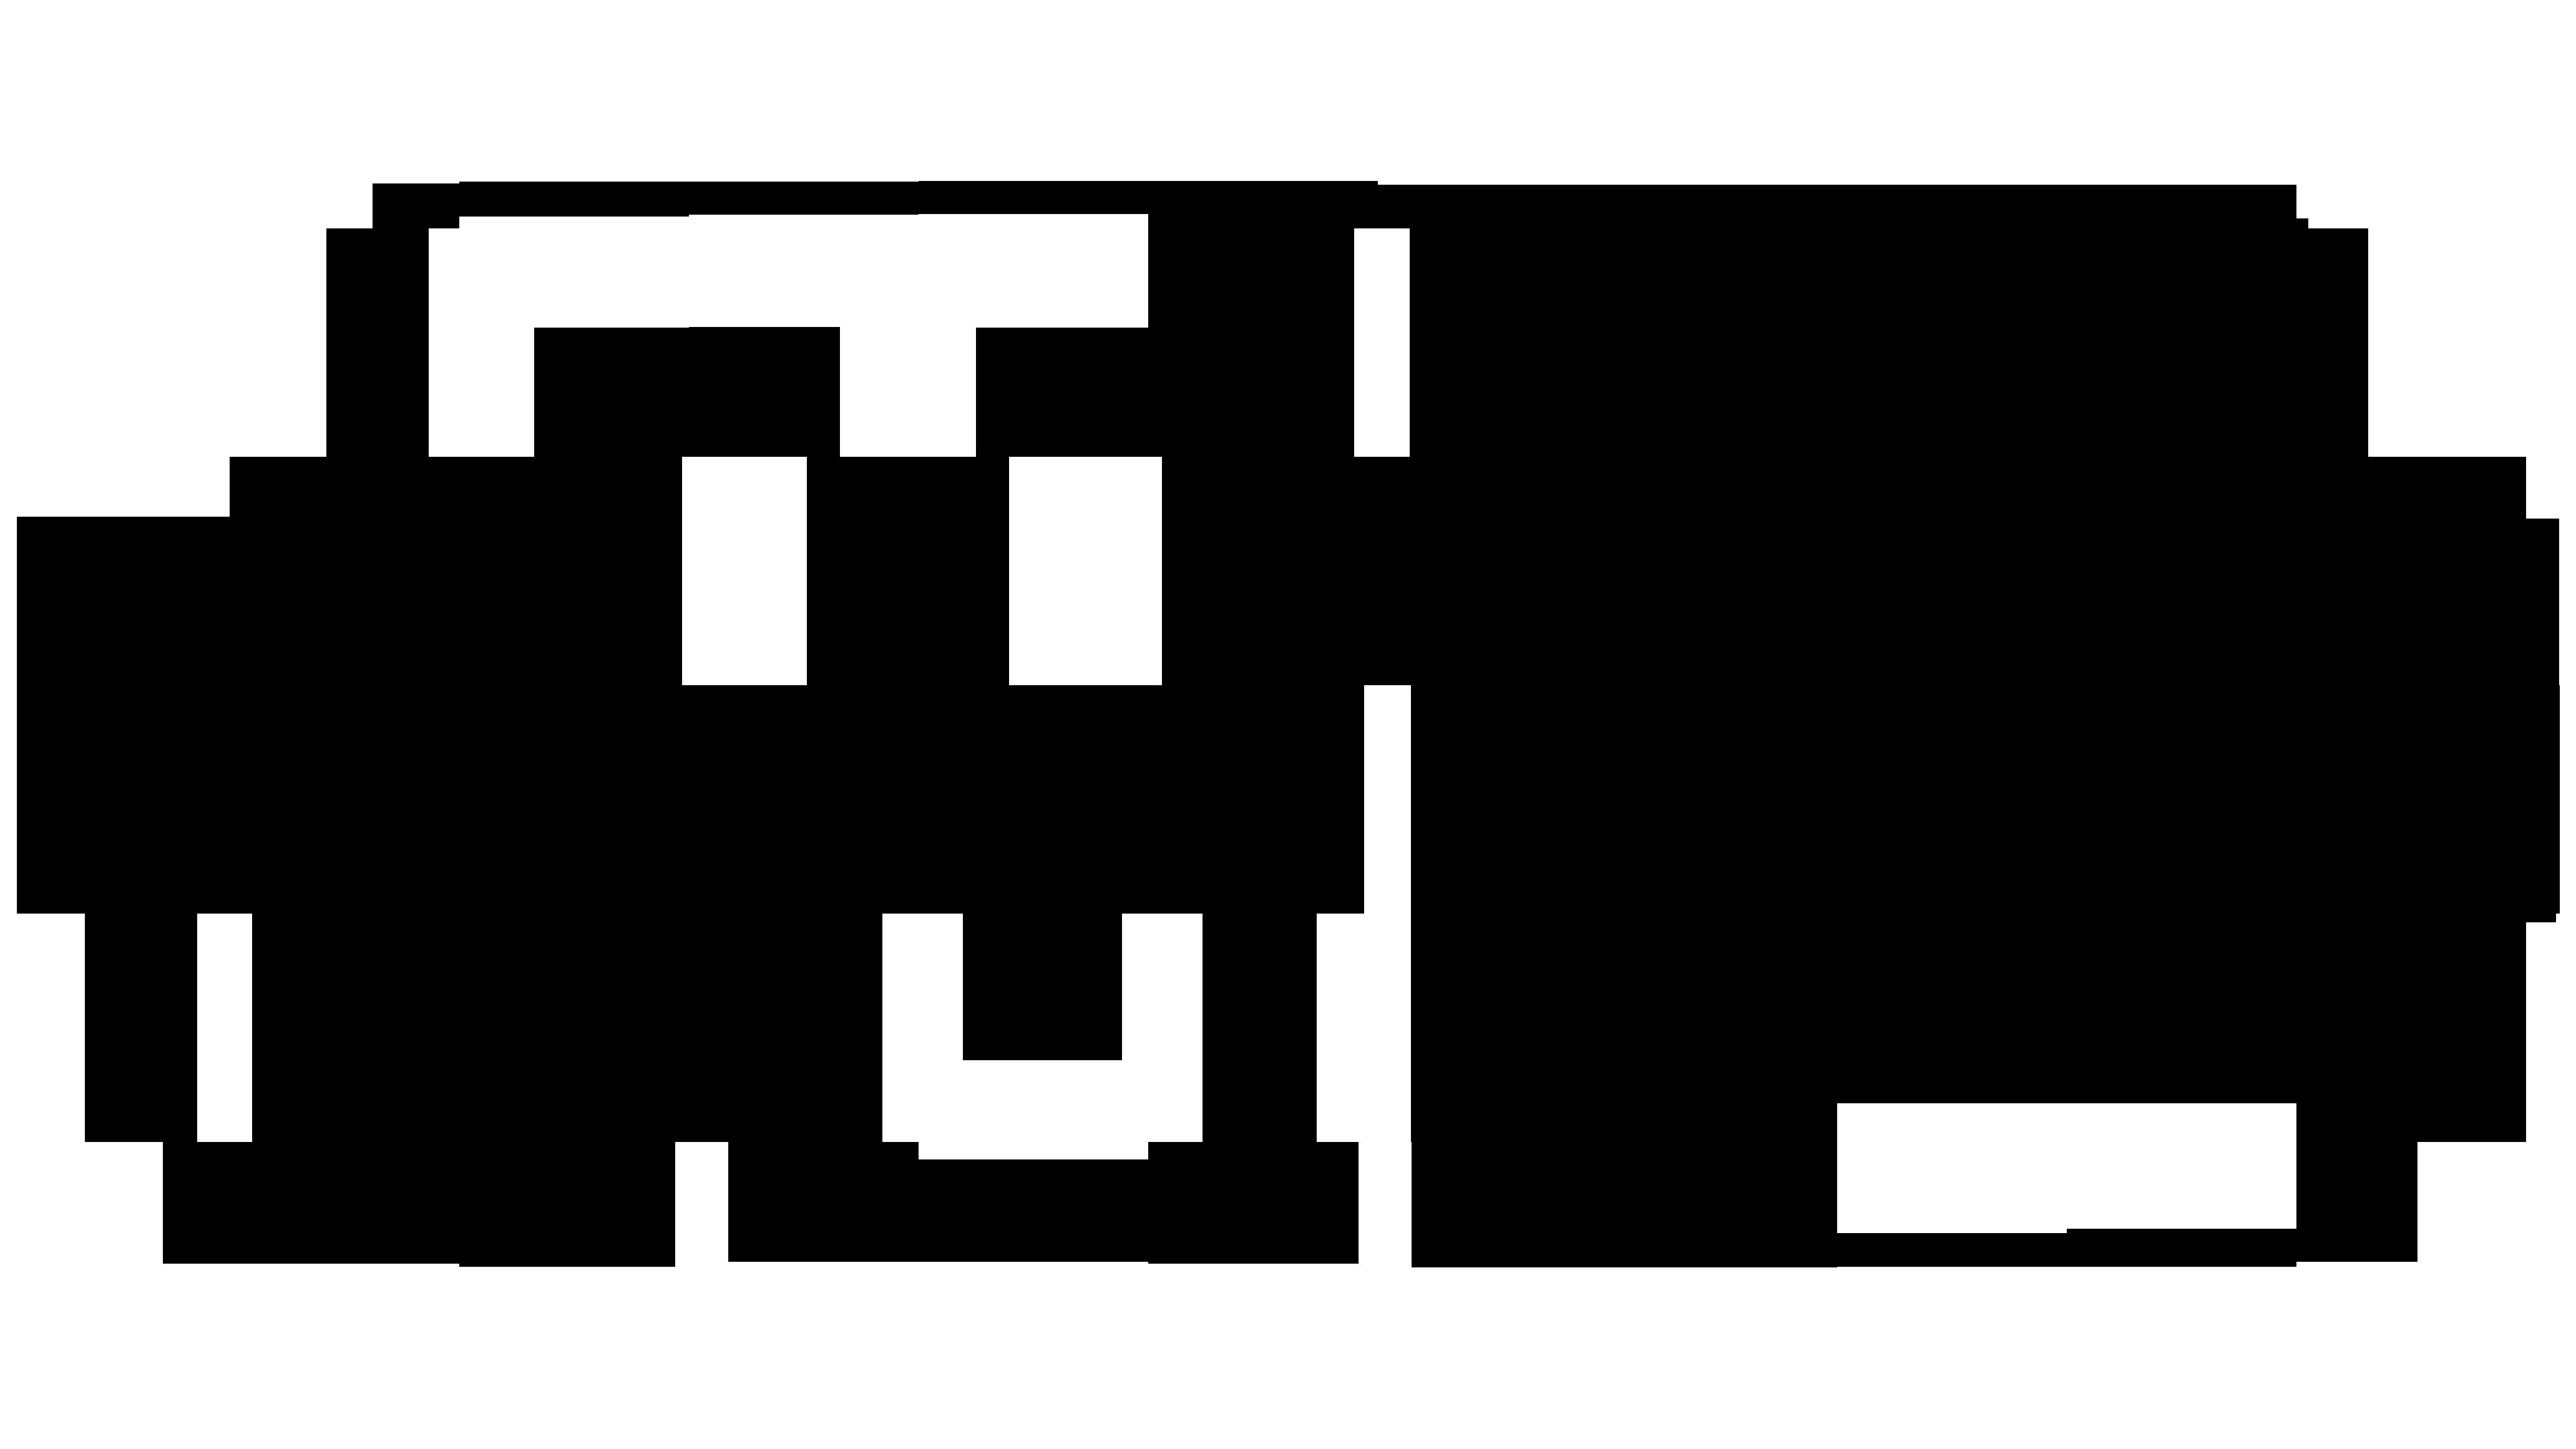 star wars logo - HD2059×881